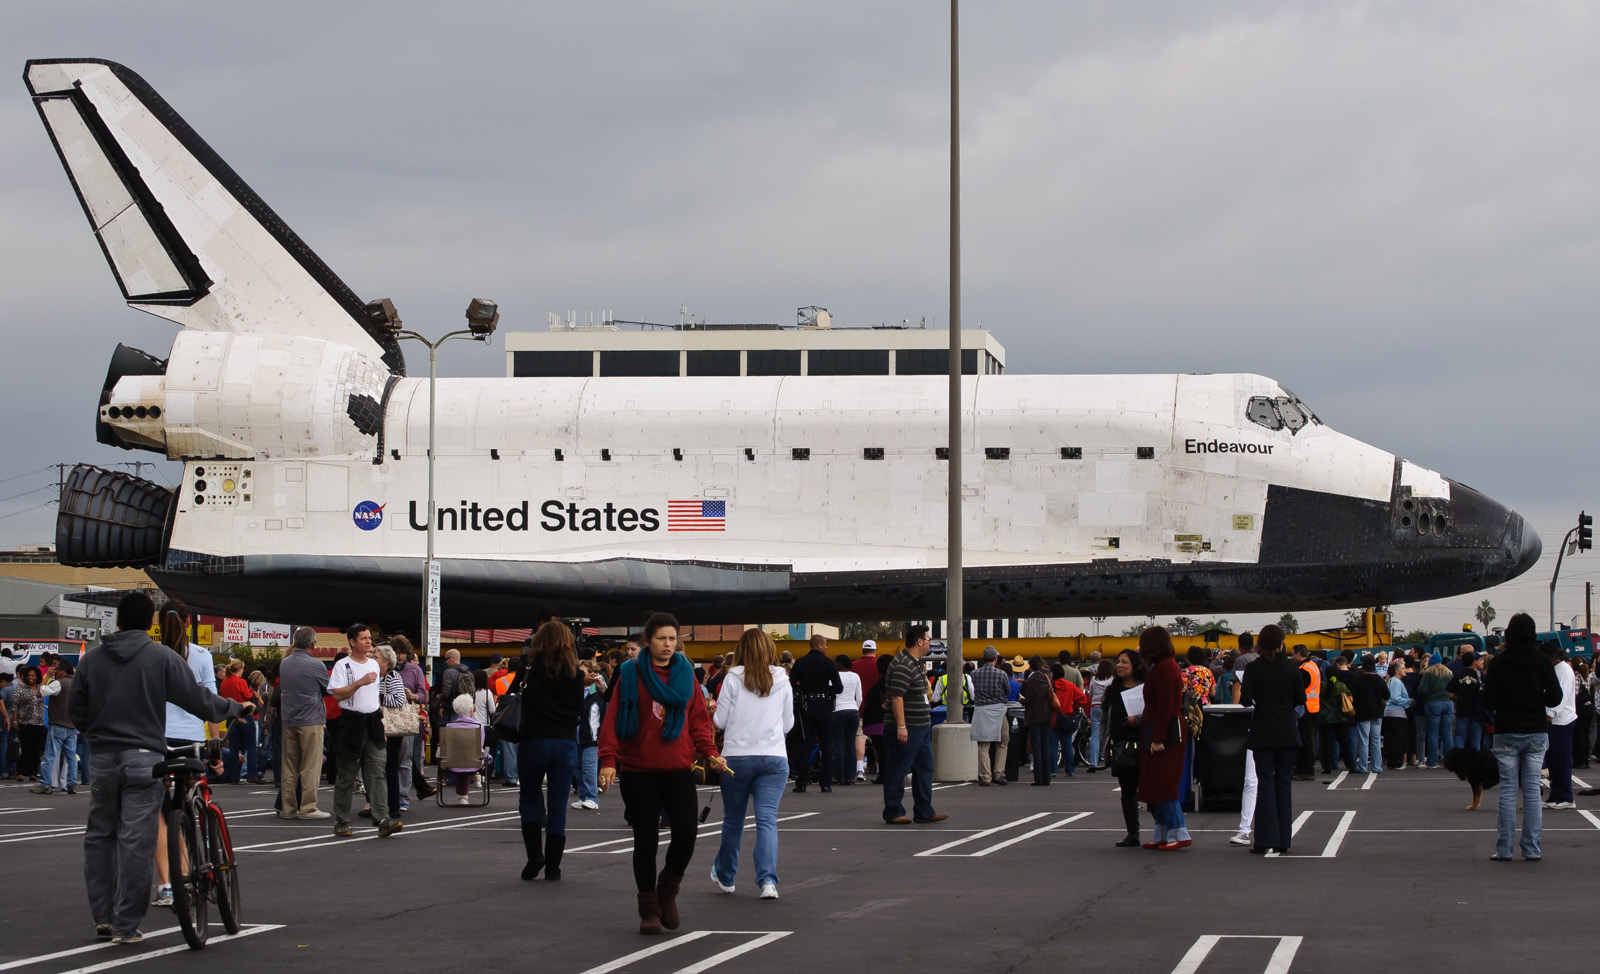 space shuttle endeavour size - photo #17